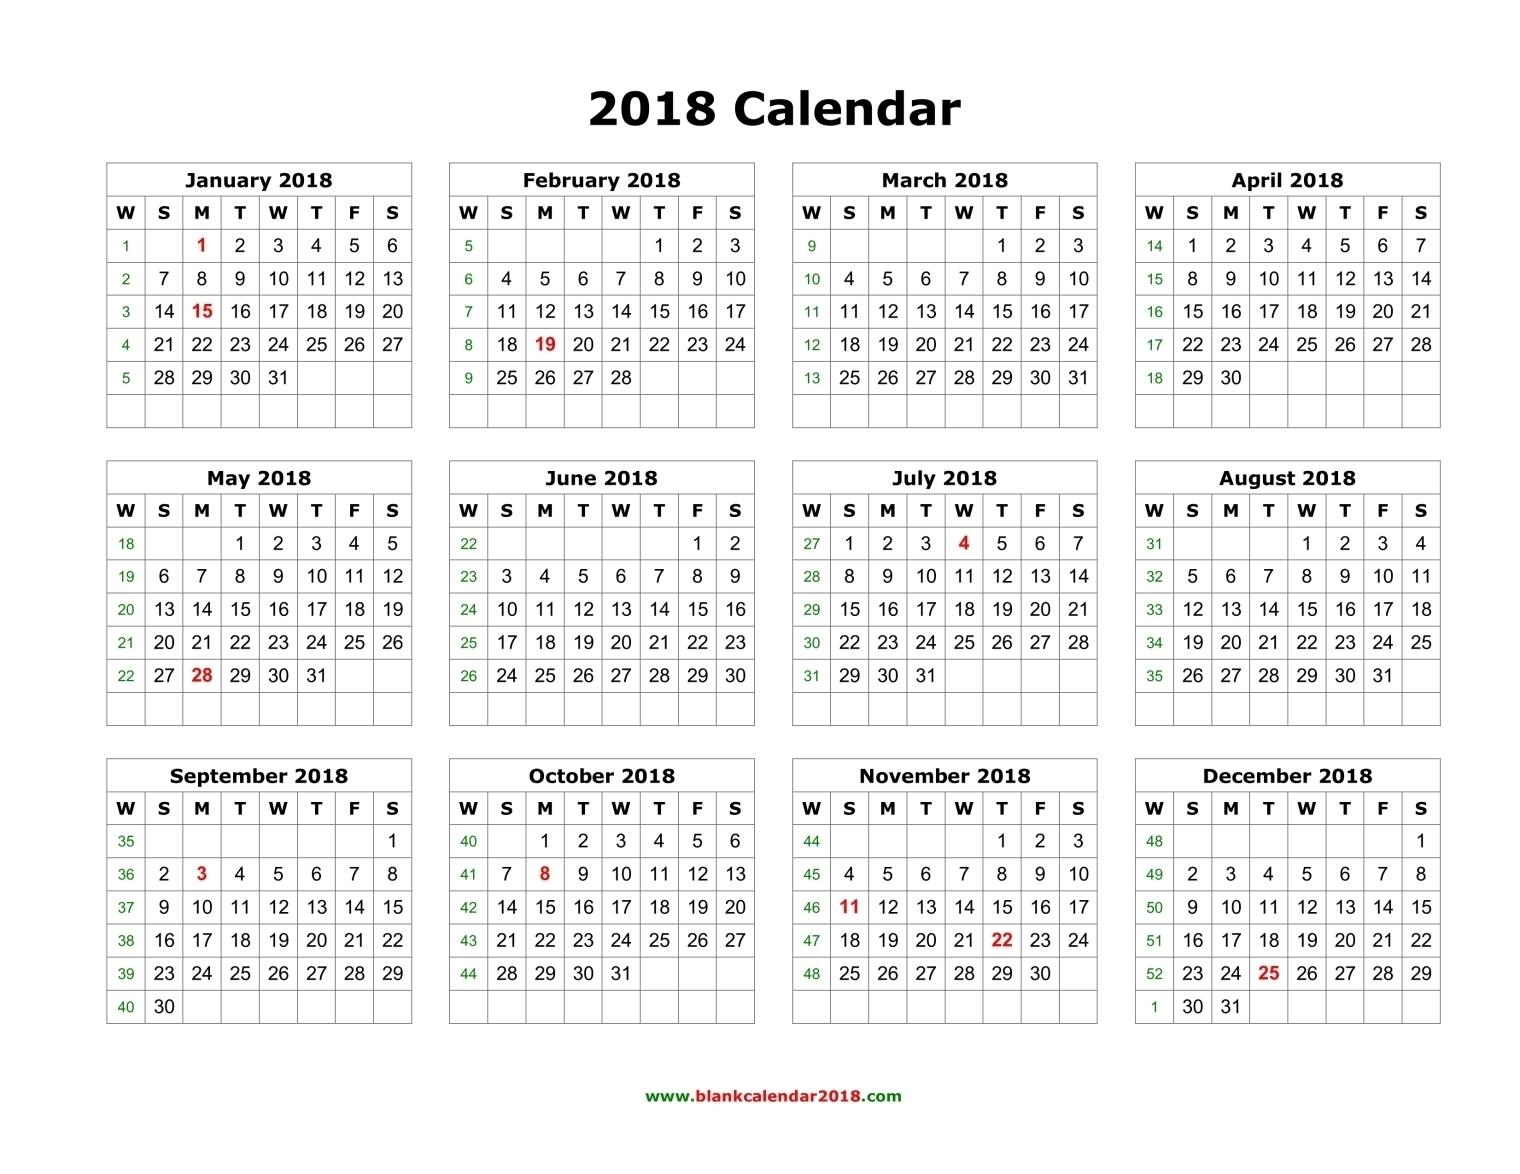 Blank Calendar 2018 regarding 1 Page Year Long Calendar Printable Free